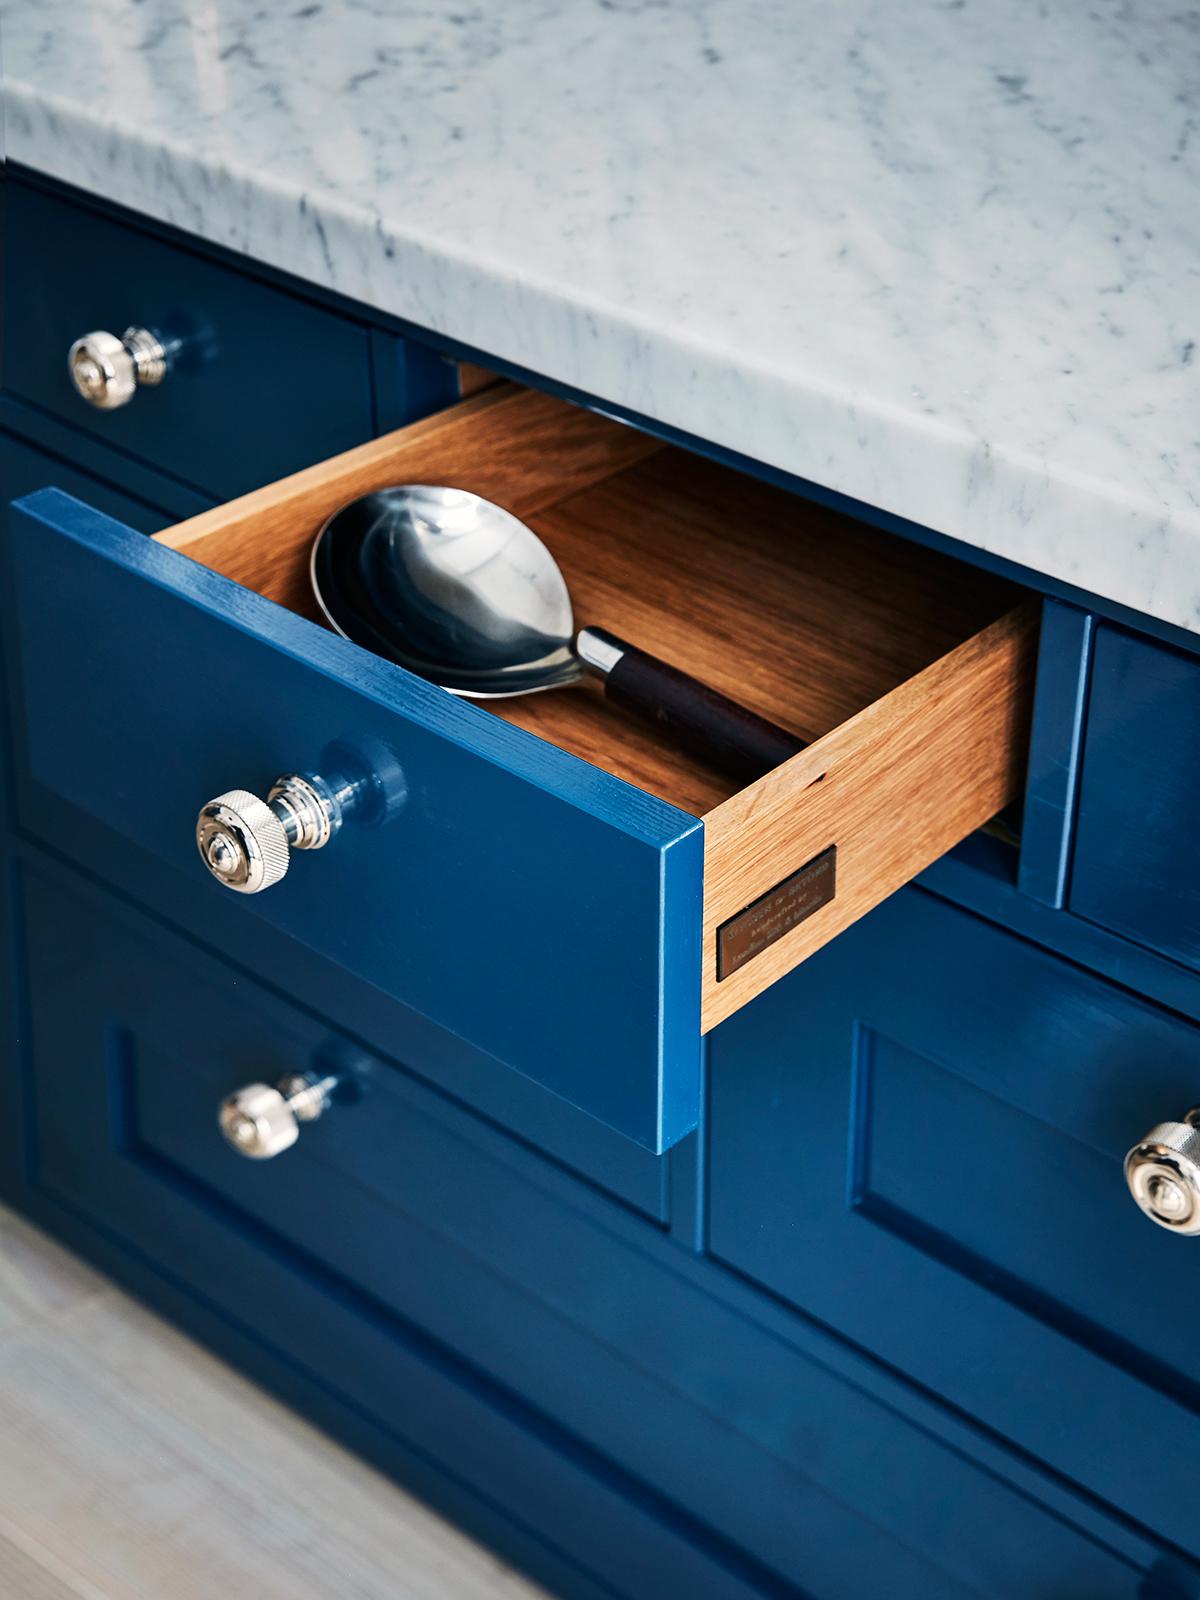 Kitchen and beyond-blue-webb-007.jpg